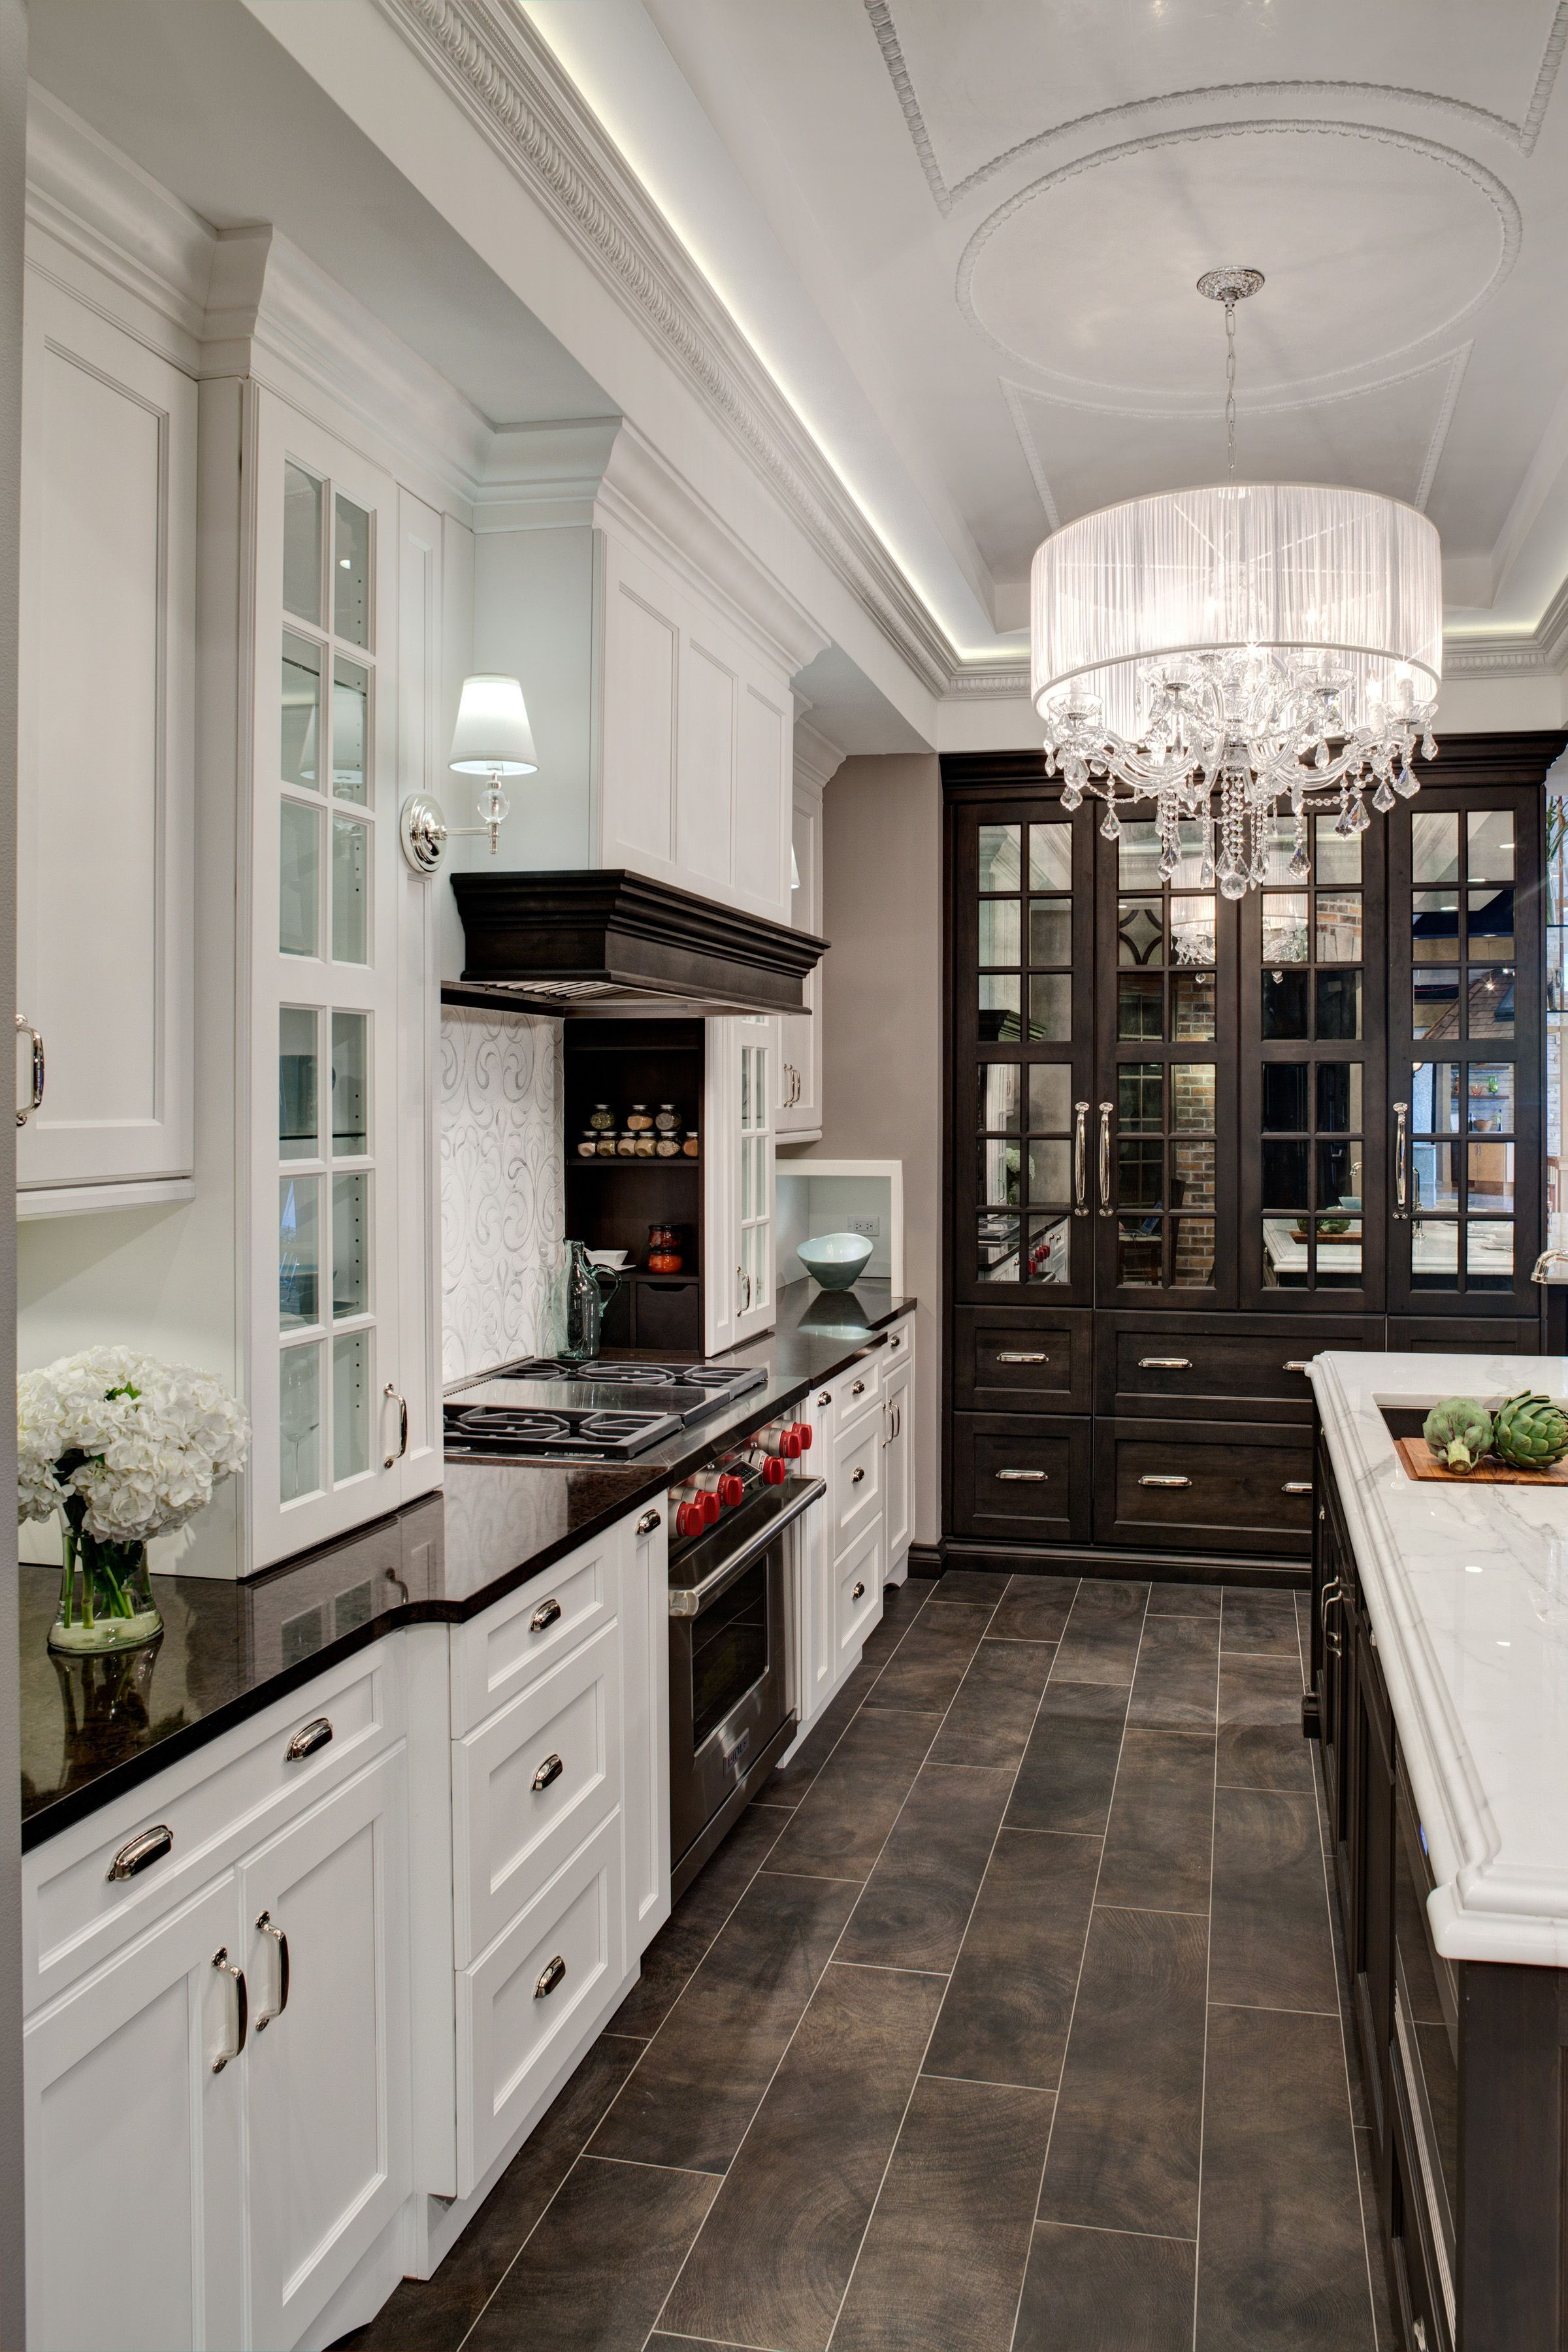 Lincolnwood design showroom kitchen display traditionalkitchens